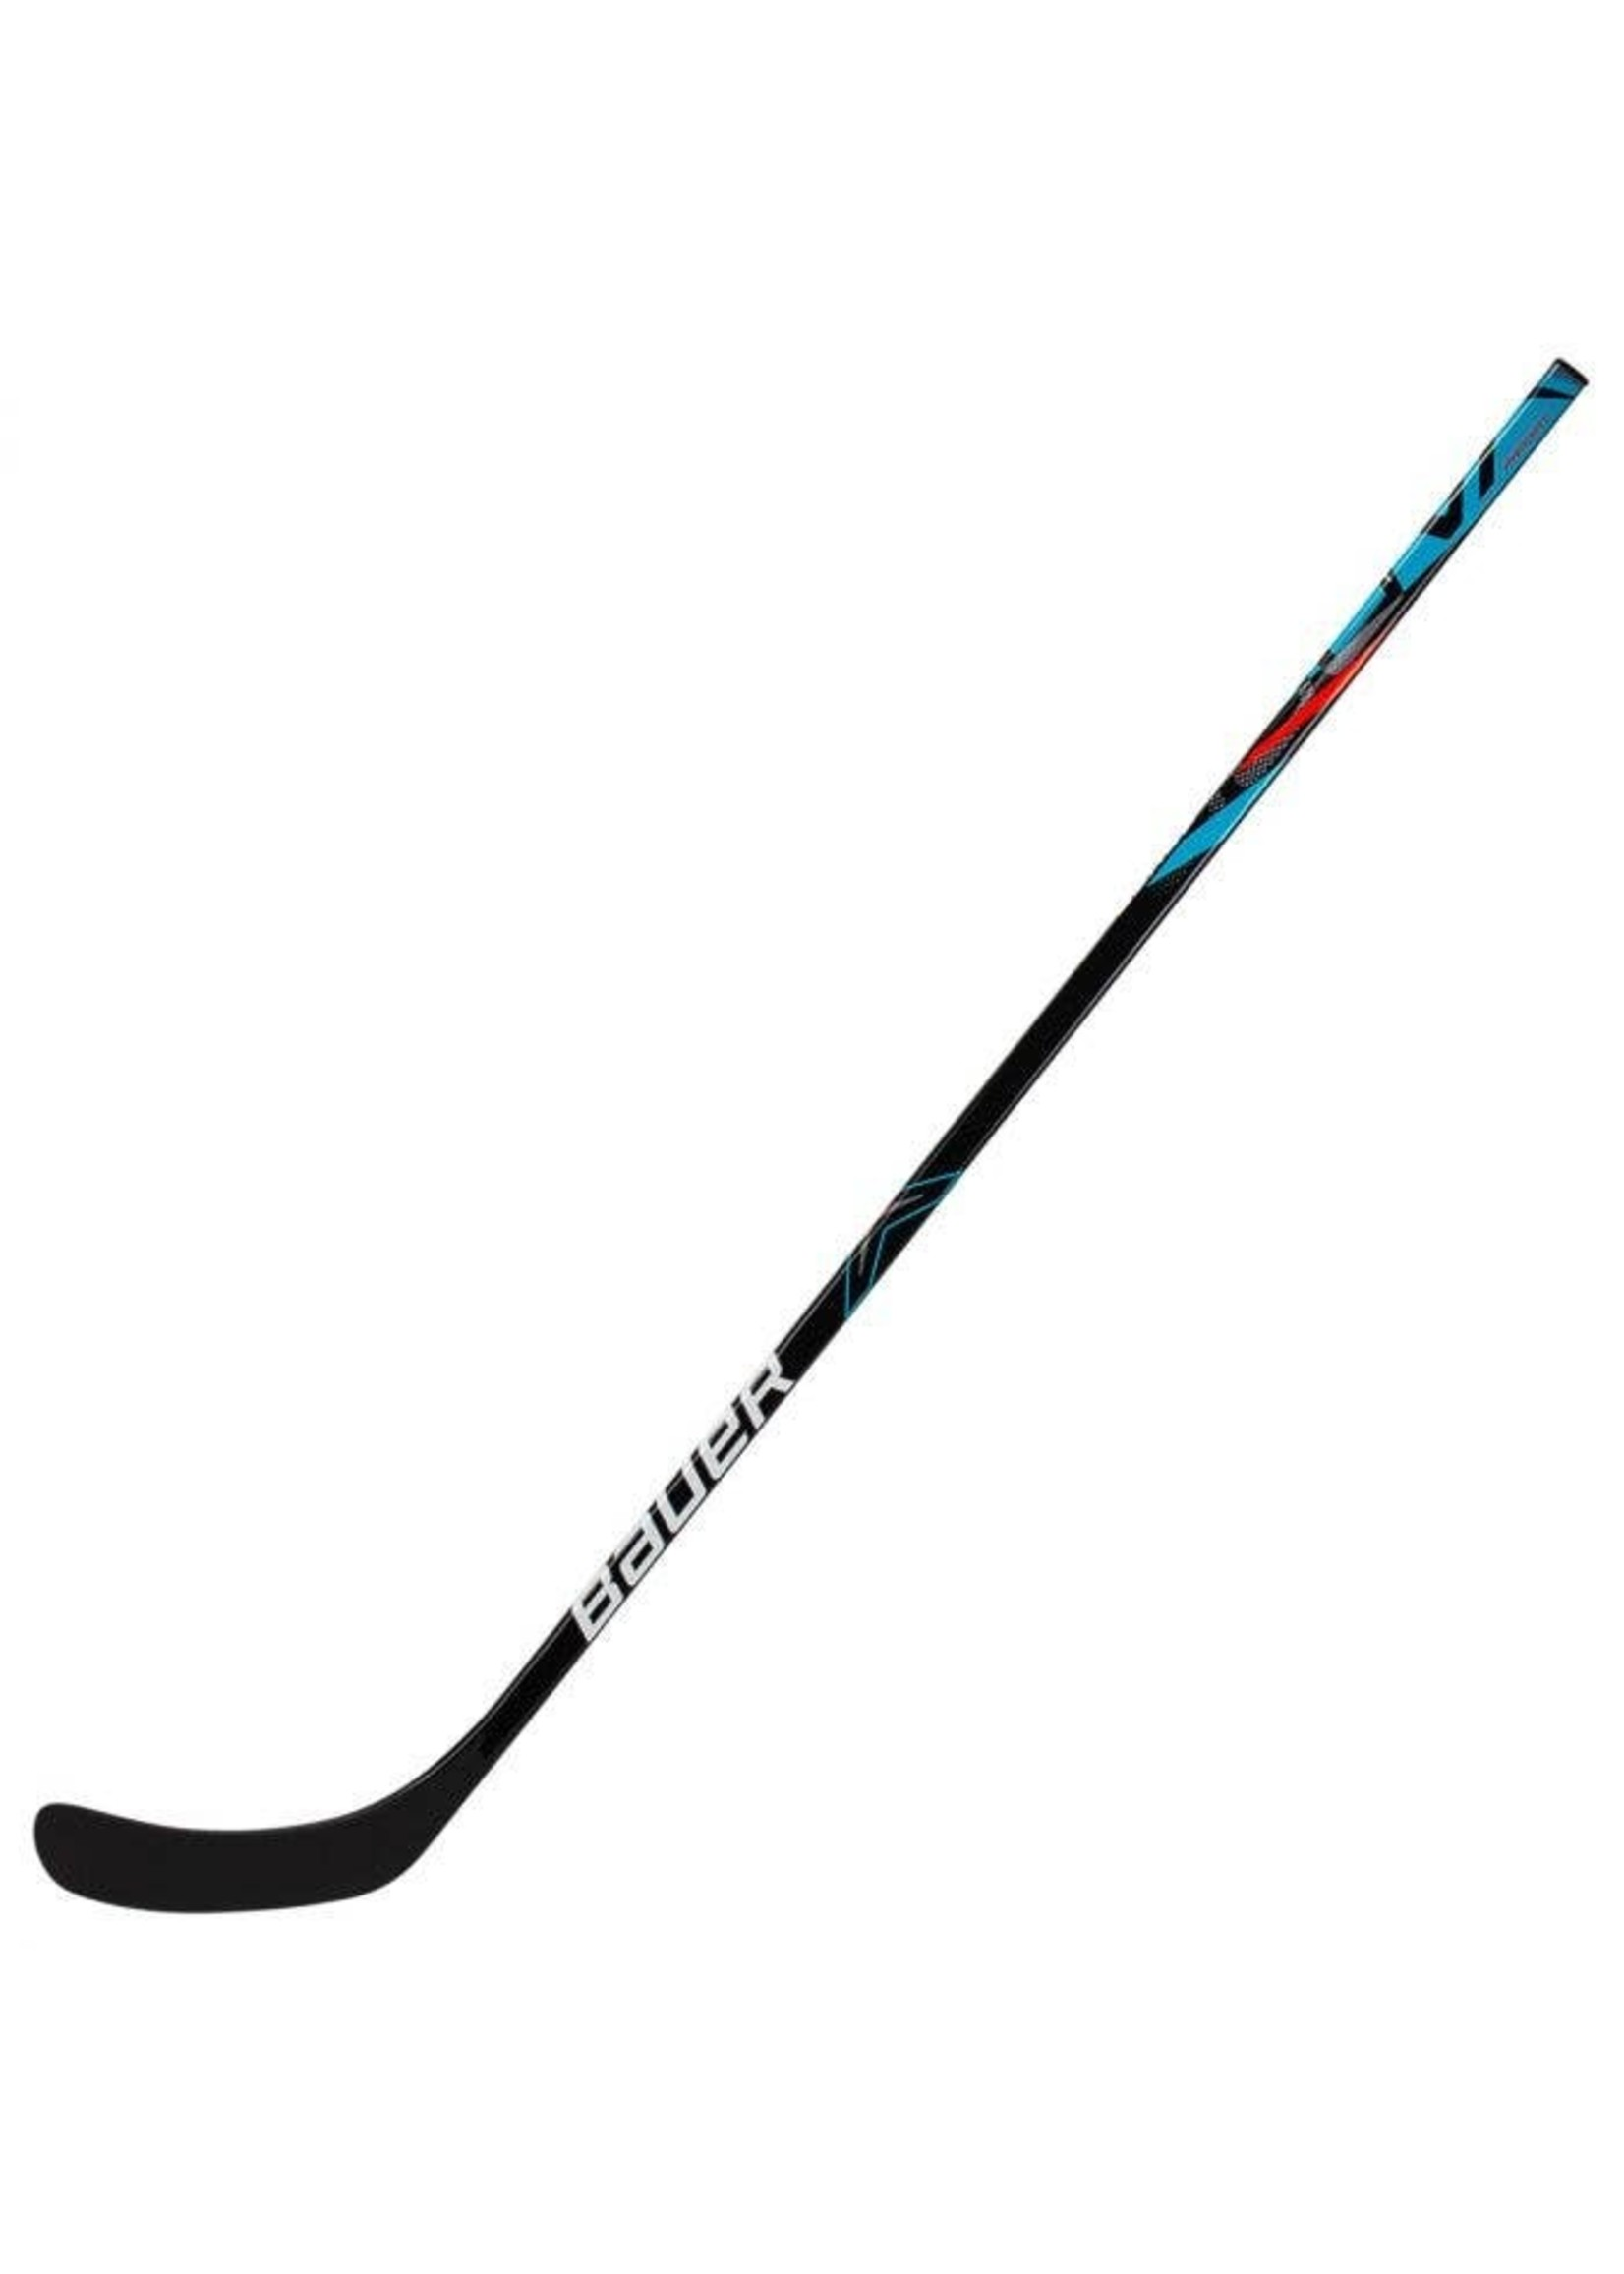 Bauer Hockey BAUER S19 VAPOR PRODIGY 40 FLEX JR BÂTON